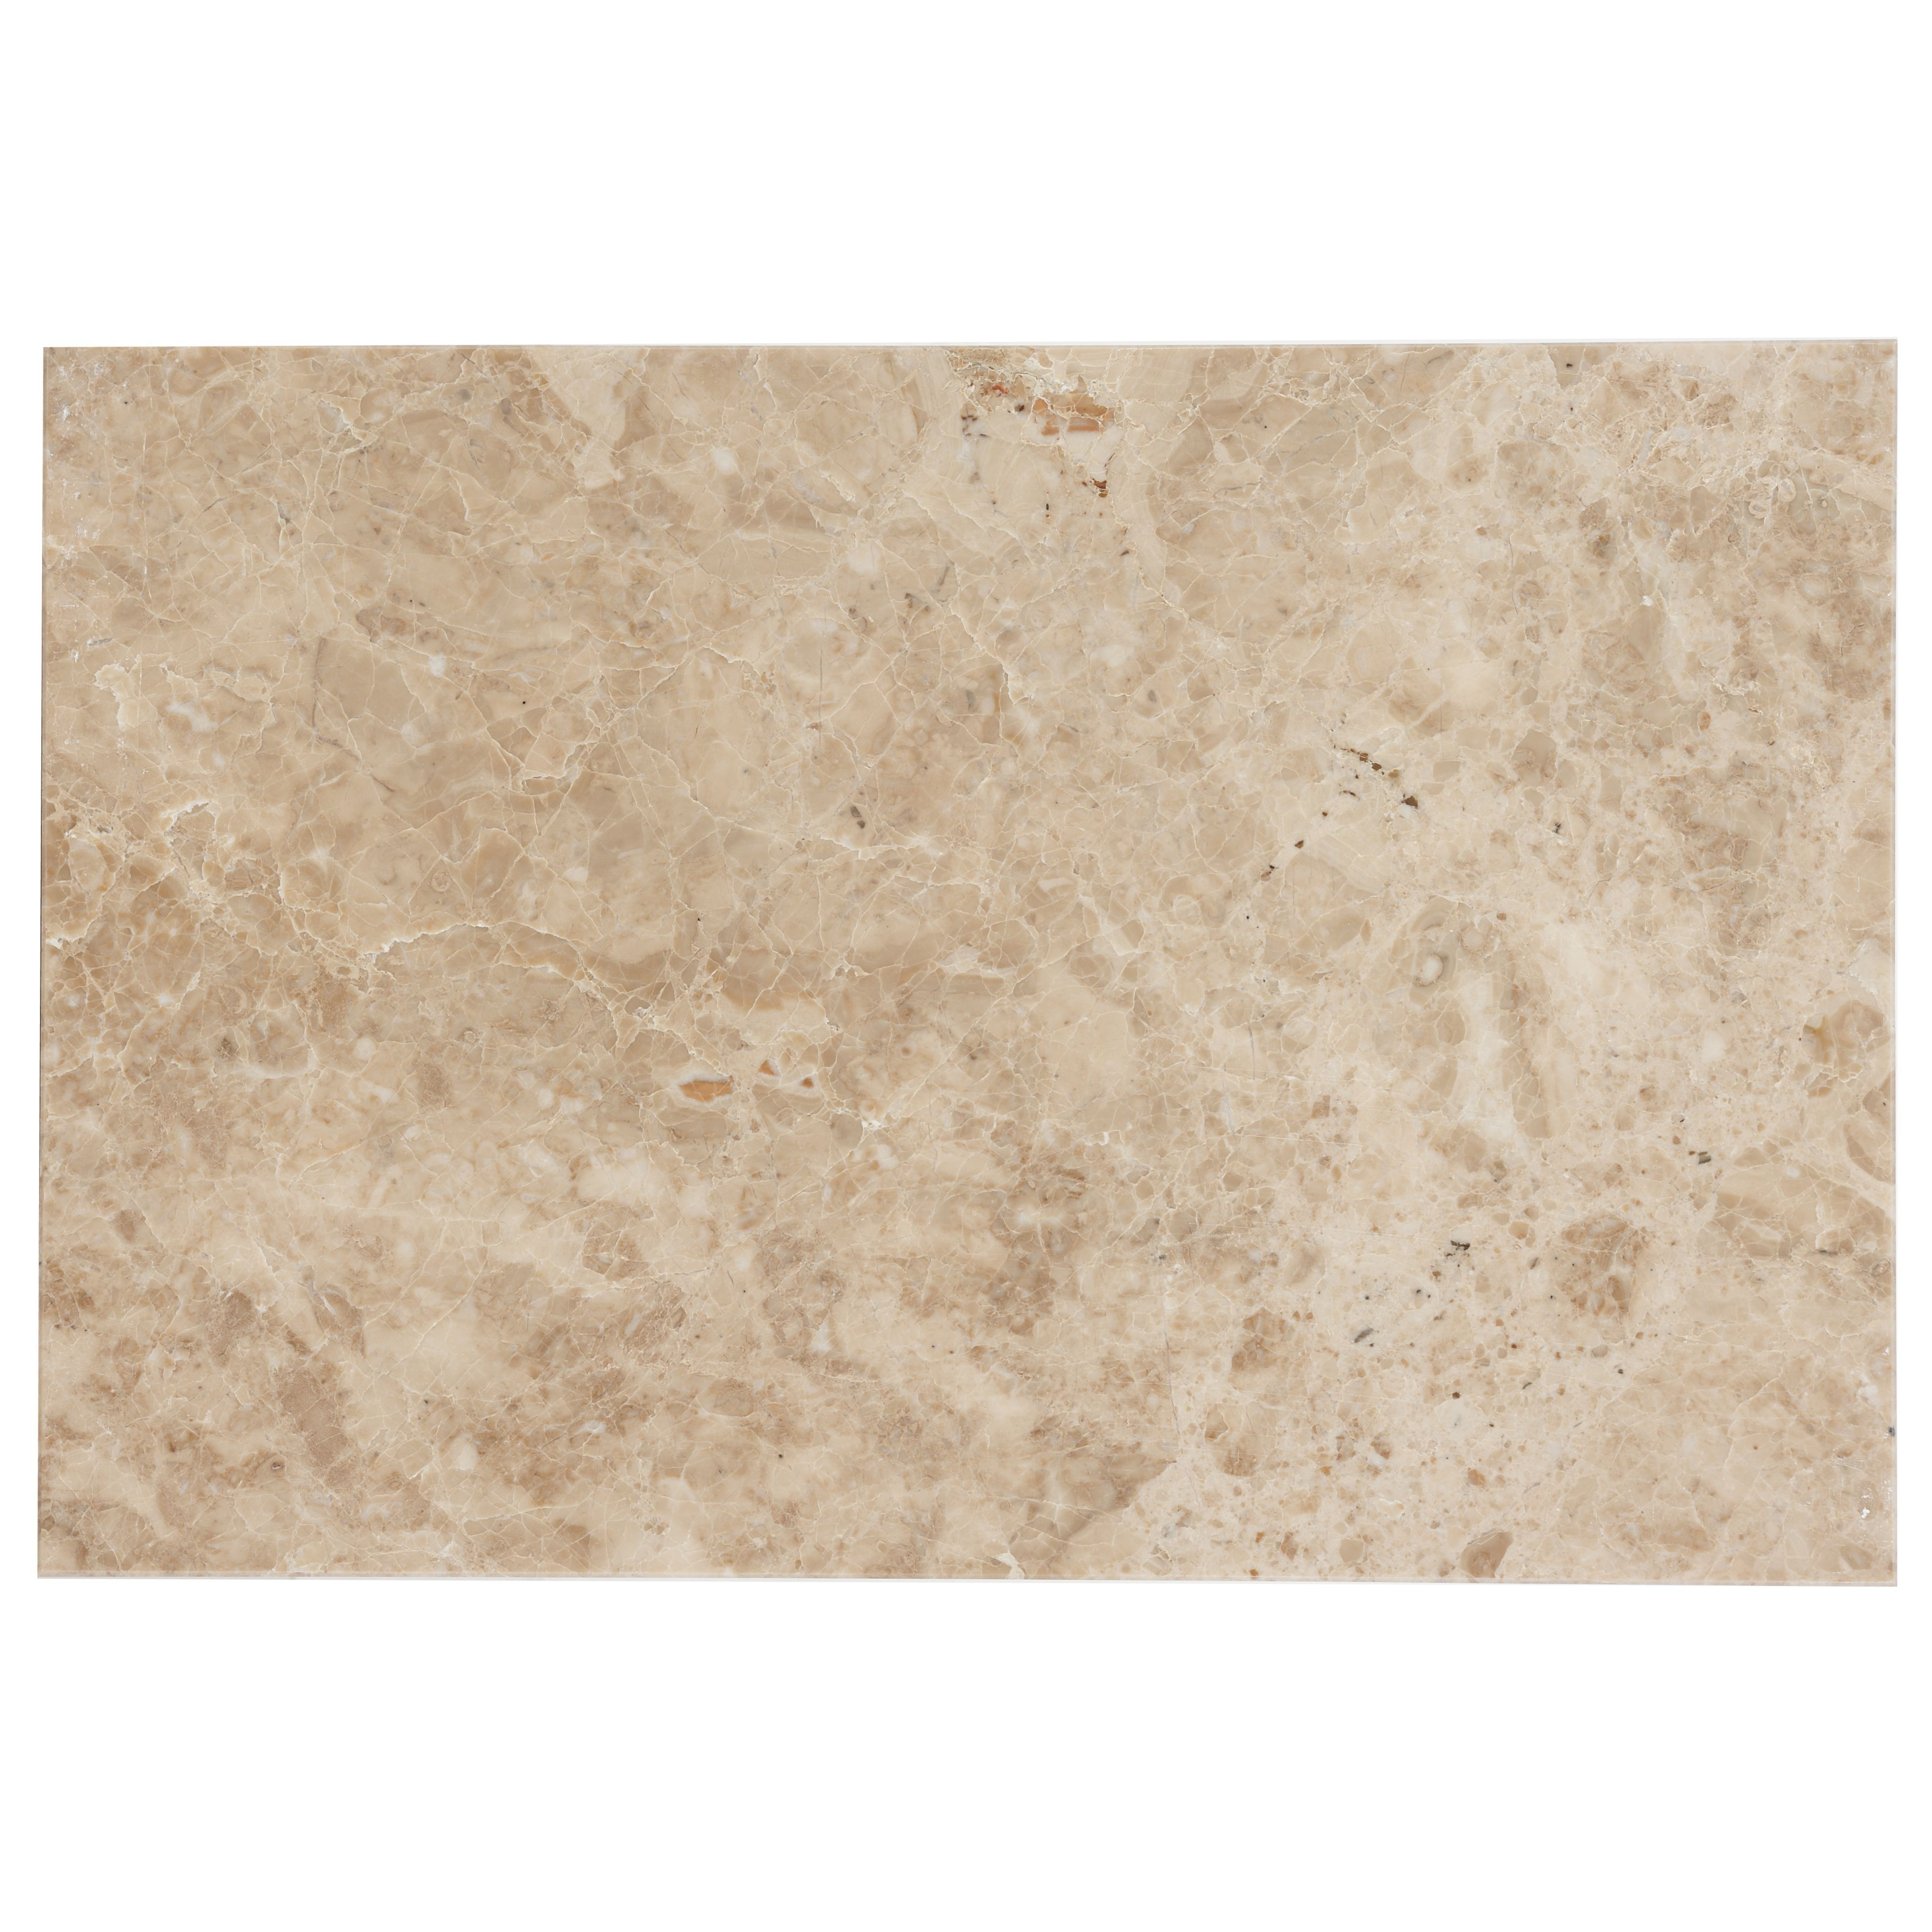 Urban White Stone Effect Ceramic Wall Floor Tile Pack: Beige Marble Effect Marble Wall & Floor Tile, Pack Of 5